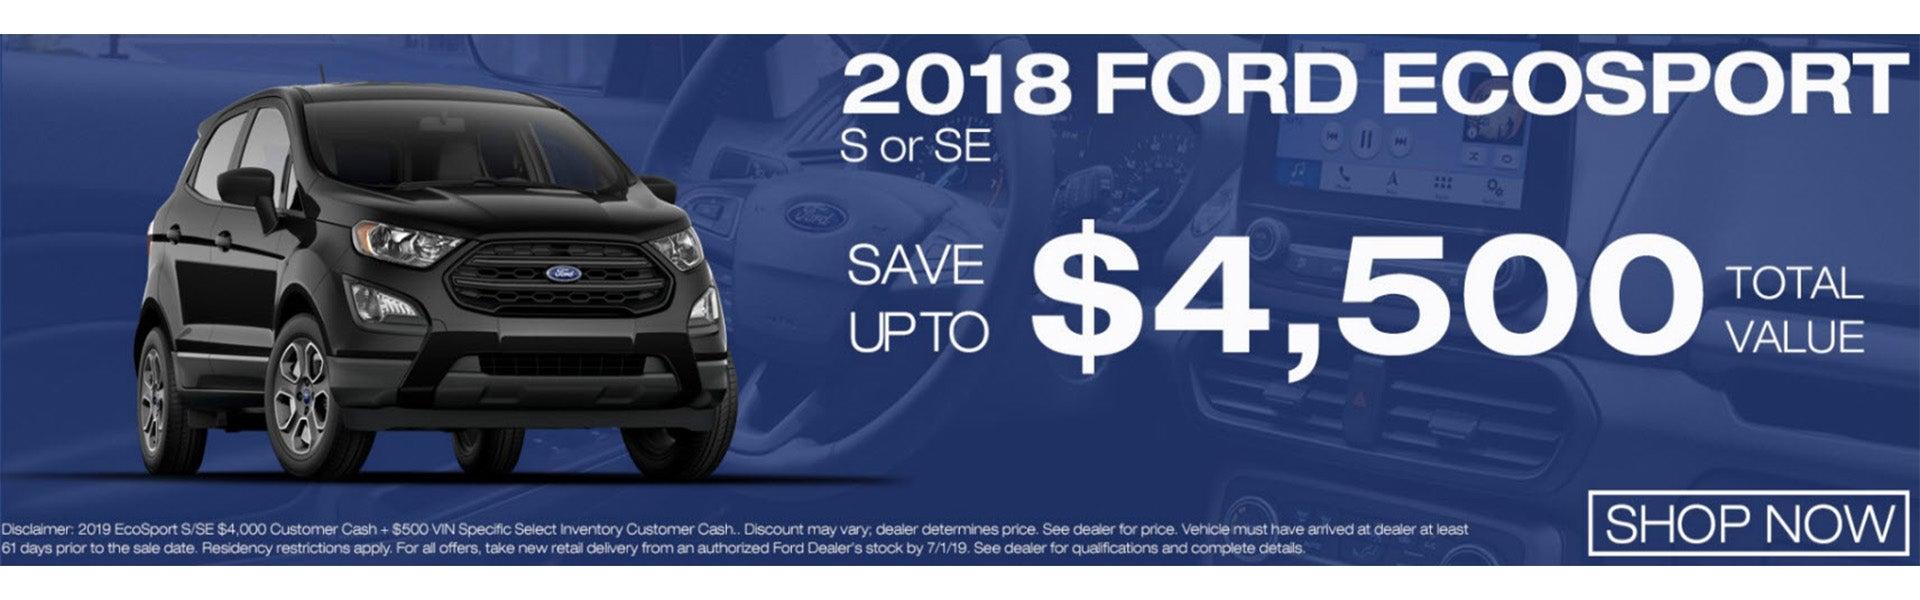 2018 Ford Ecosport On Now At Gresham